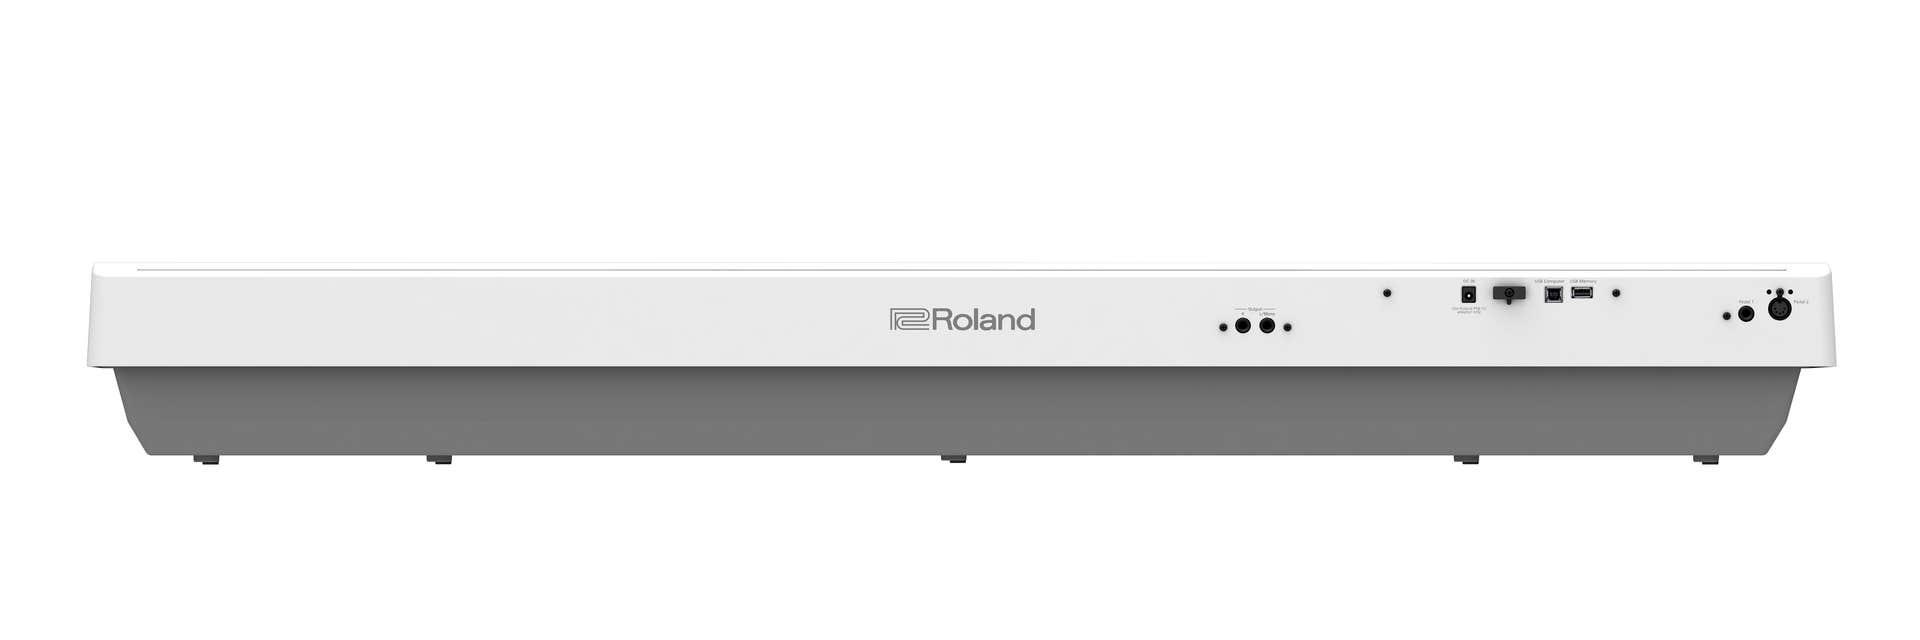 Roland FP-30X Portable Digital Piano - White